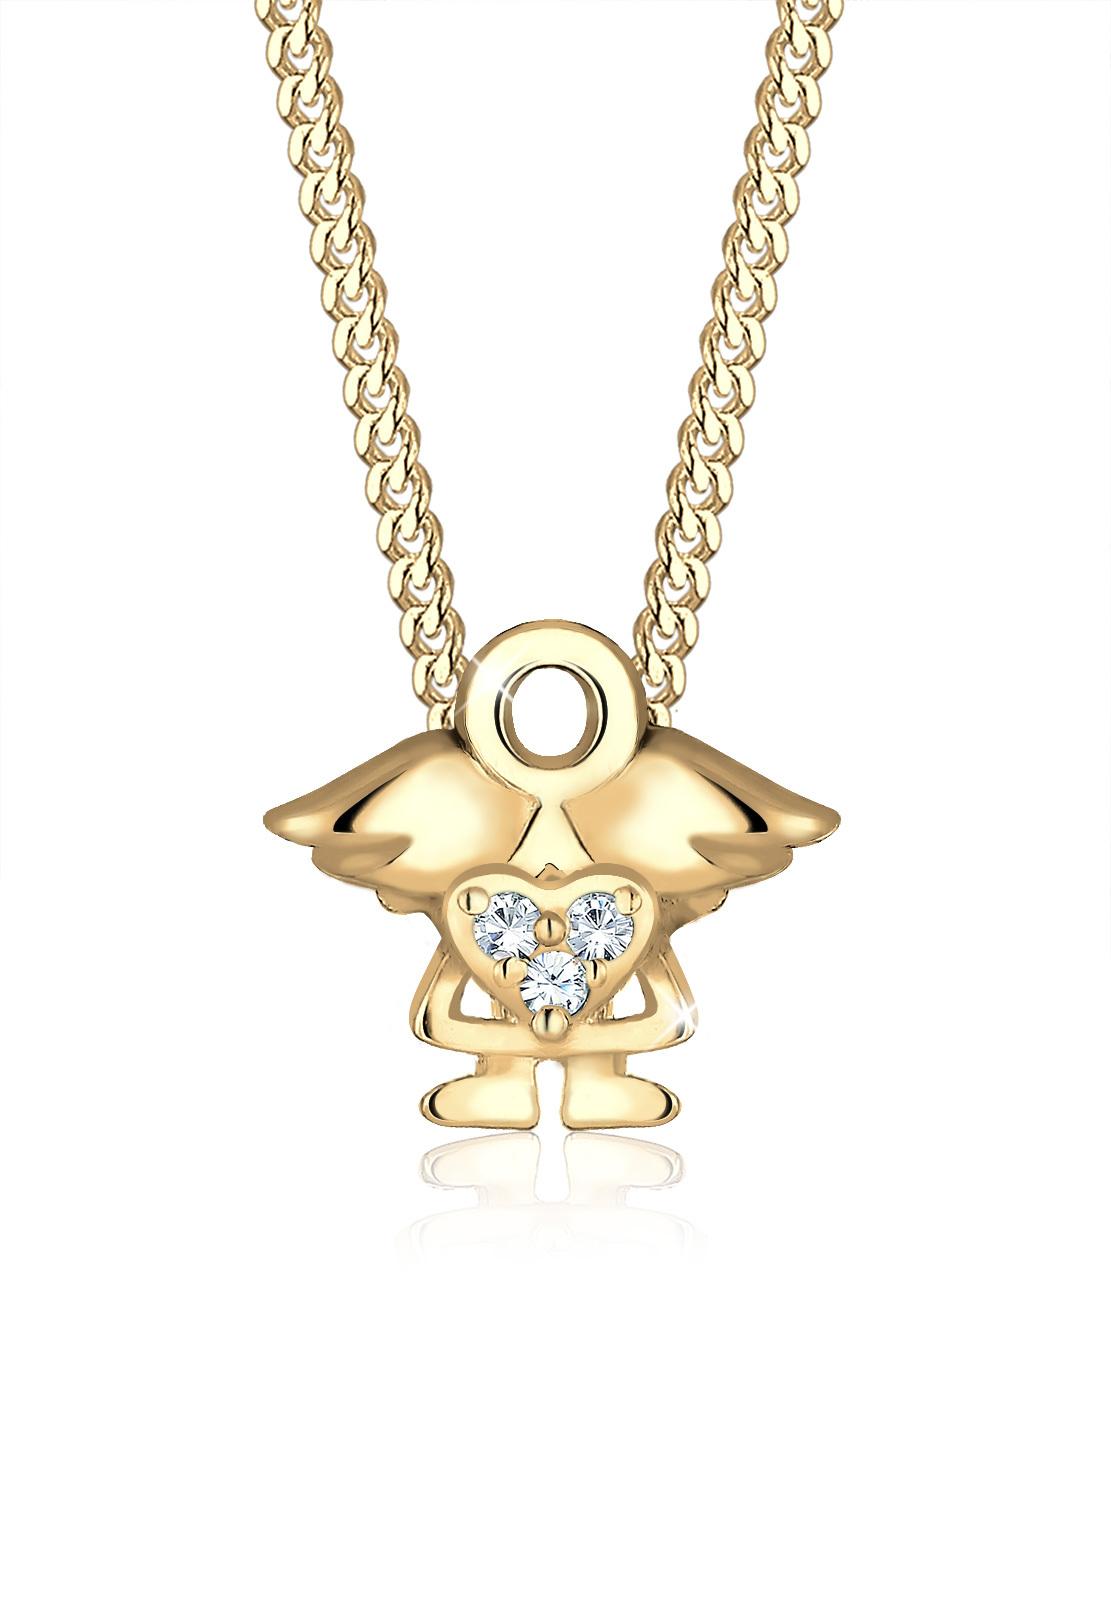 Halskette Engel | Kristall ( Weiß ) | 925 Sterling Silber vergoldet